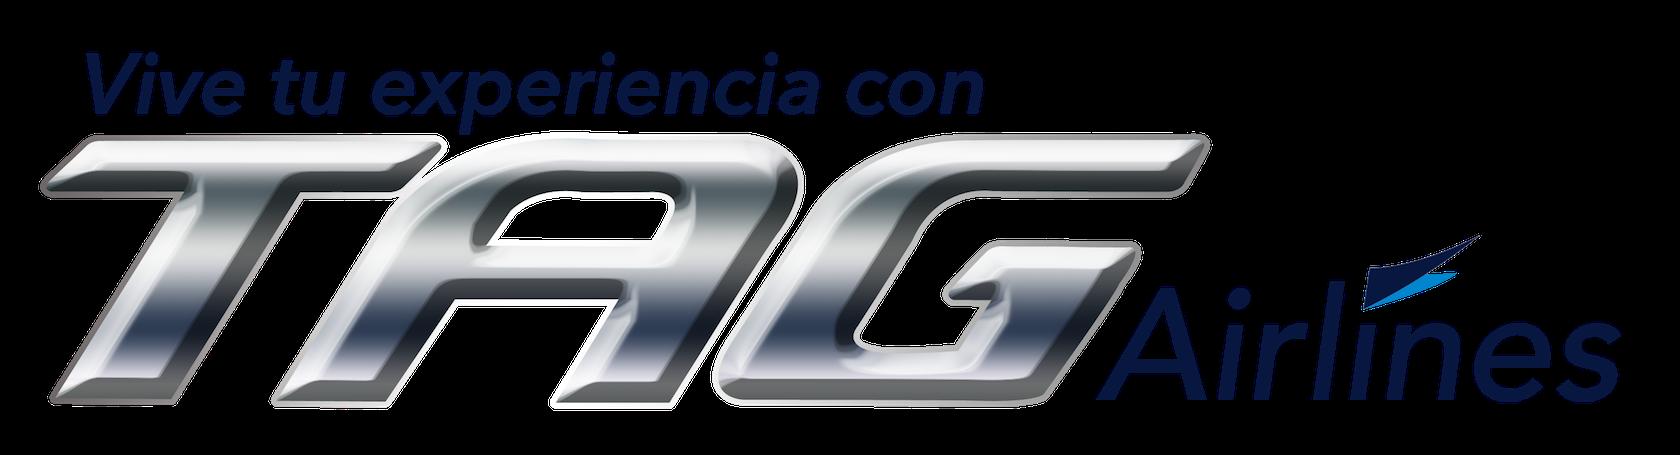 logo___new-1